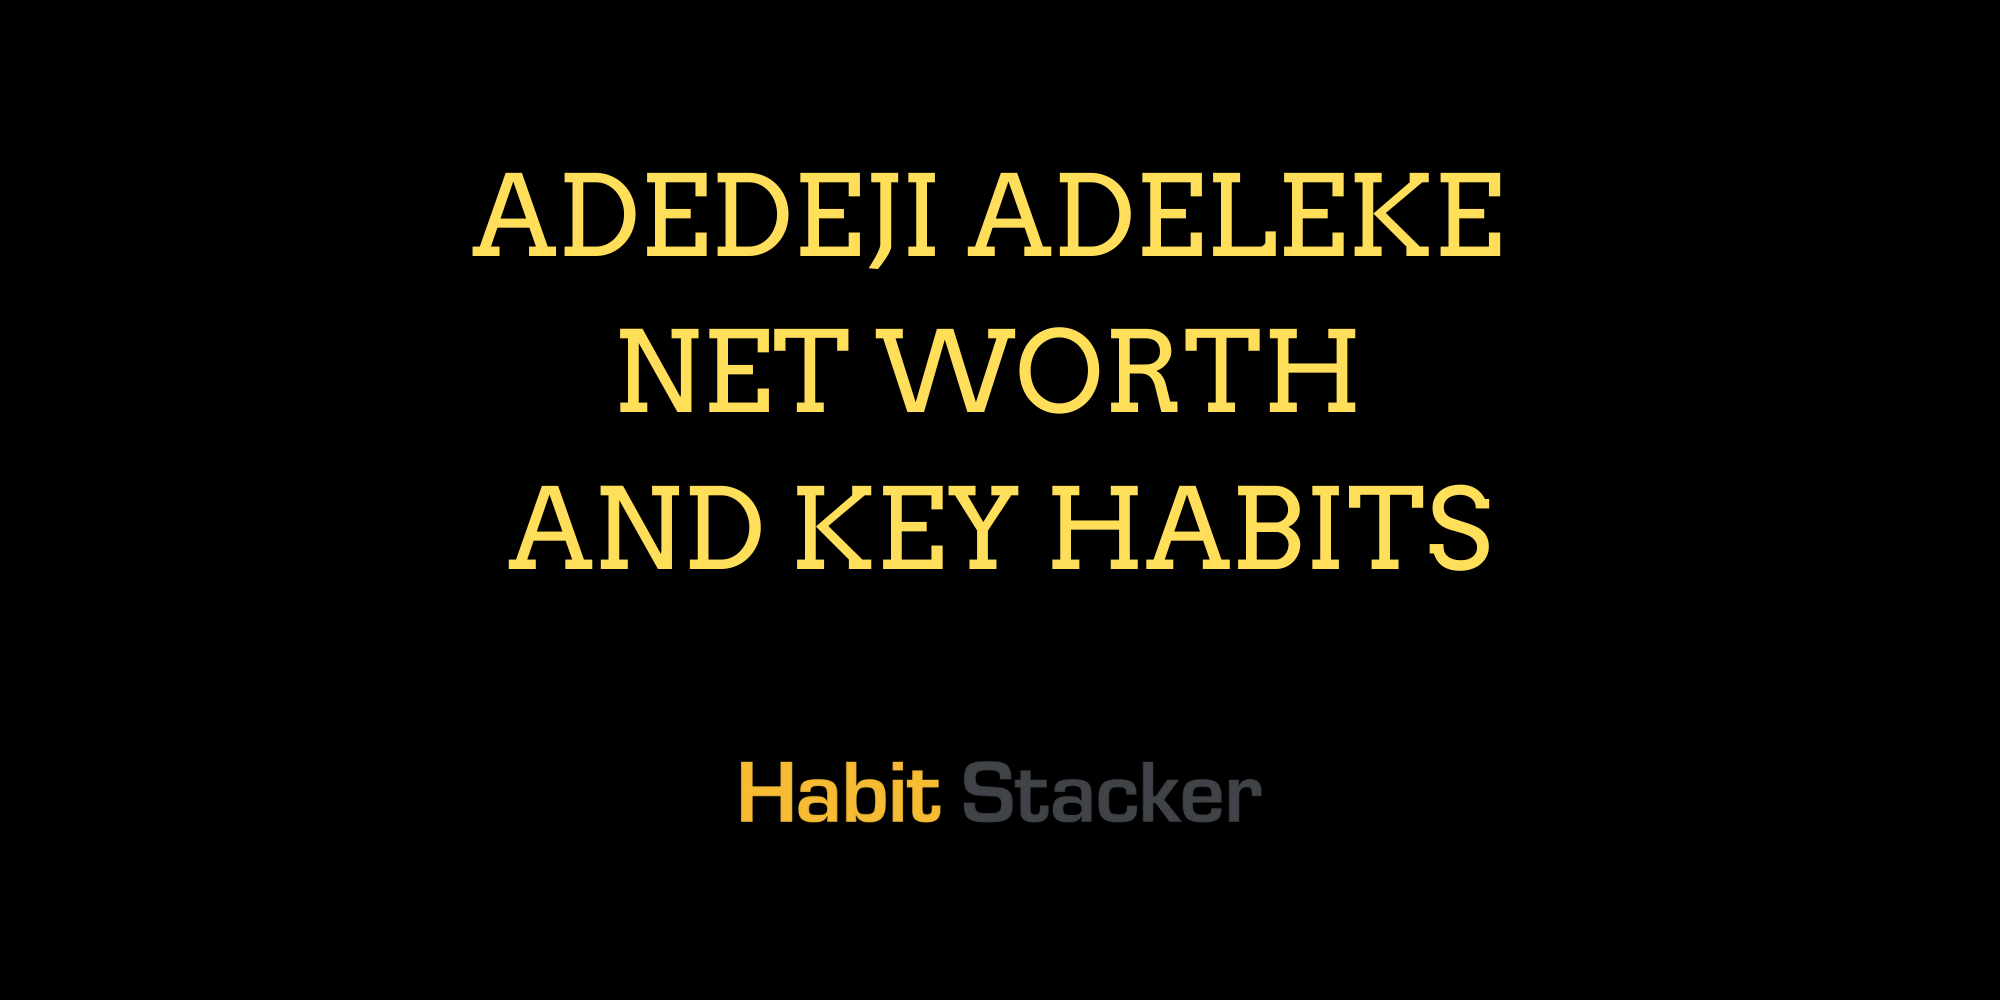 Adedeji Adeleke Net Worth and Key Habits